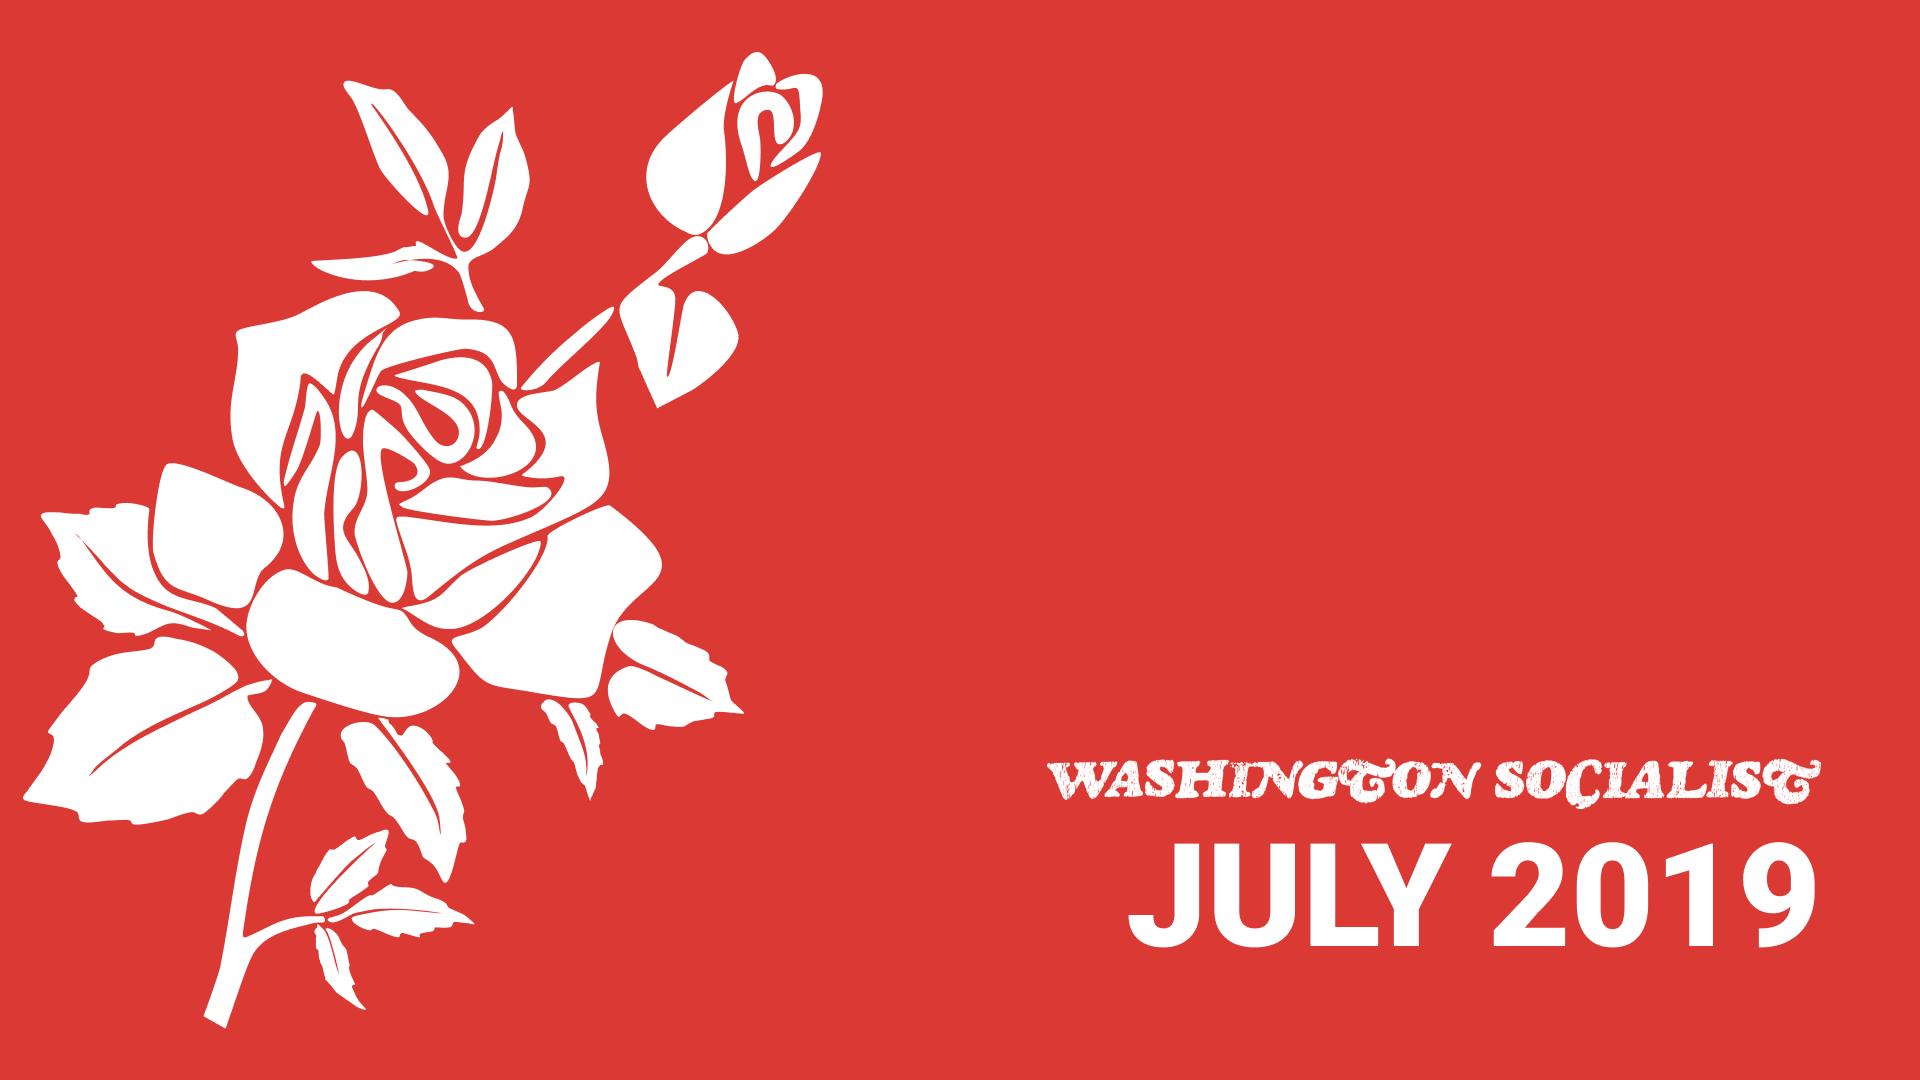 Washington Socialist Cover, July 2019